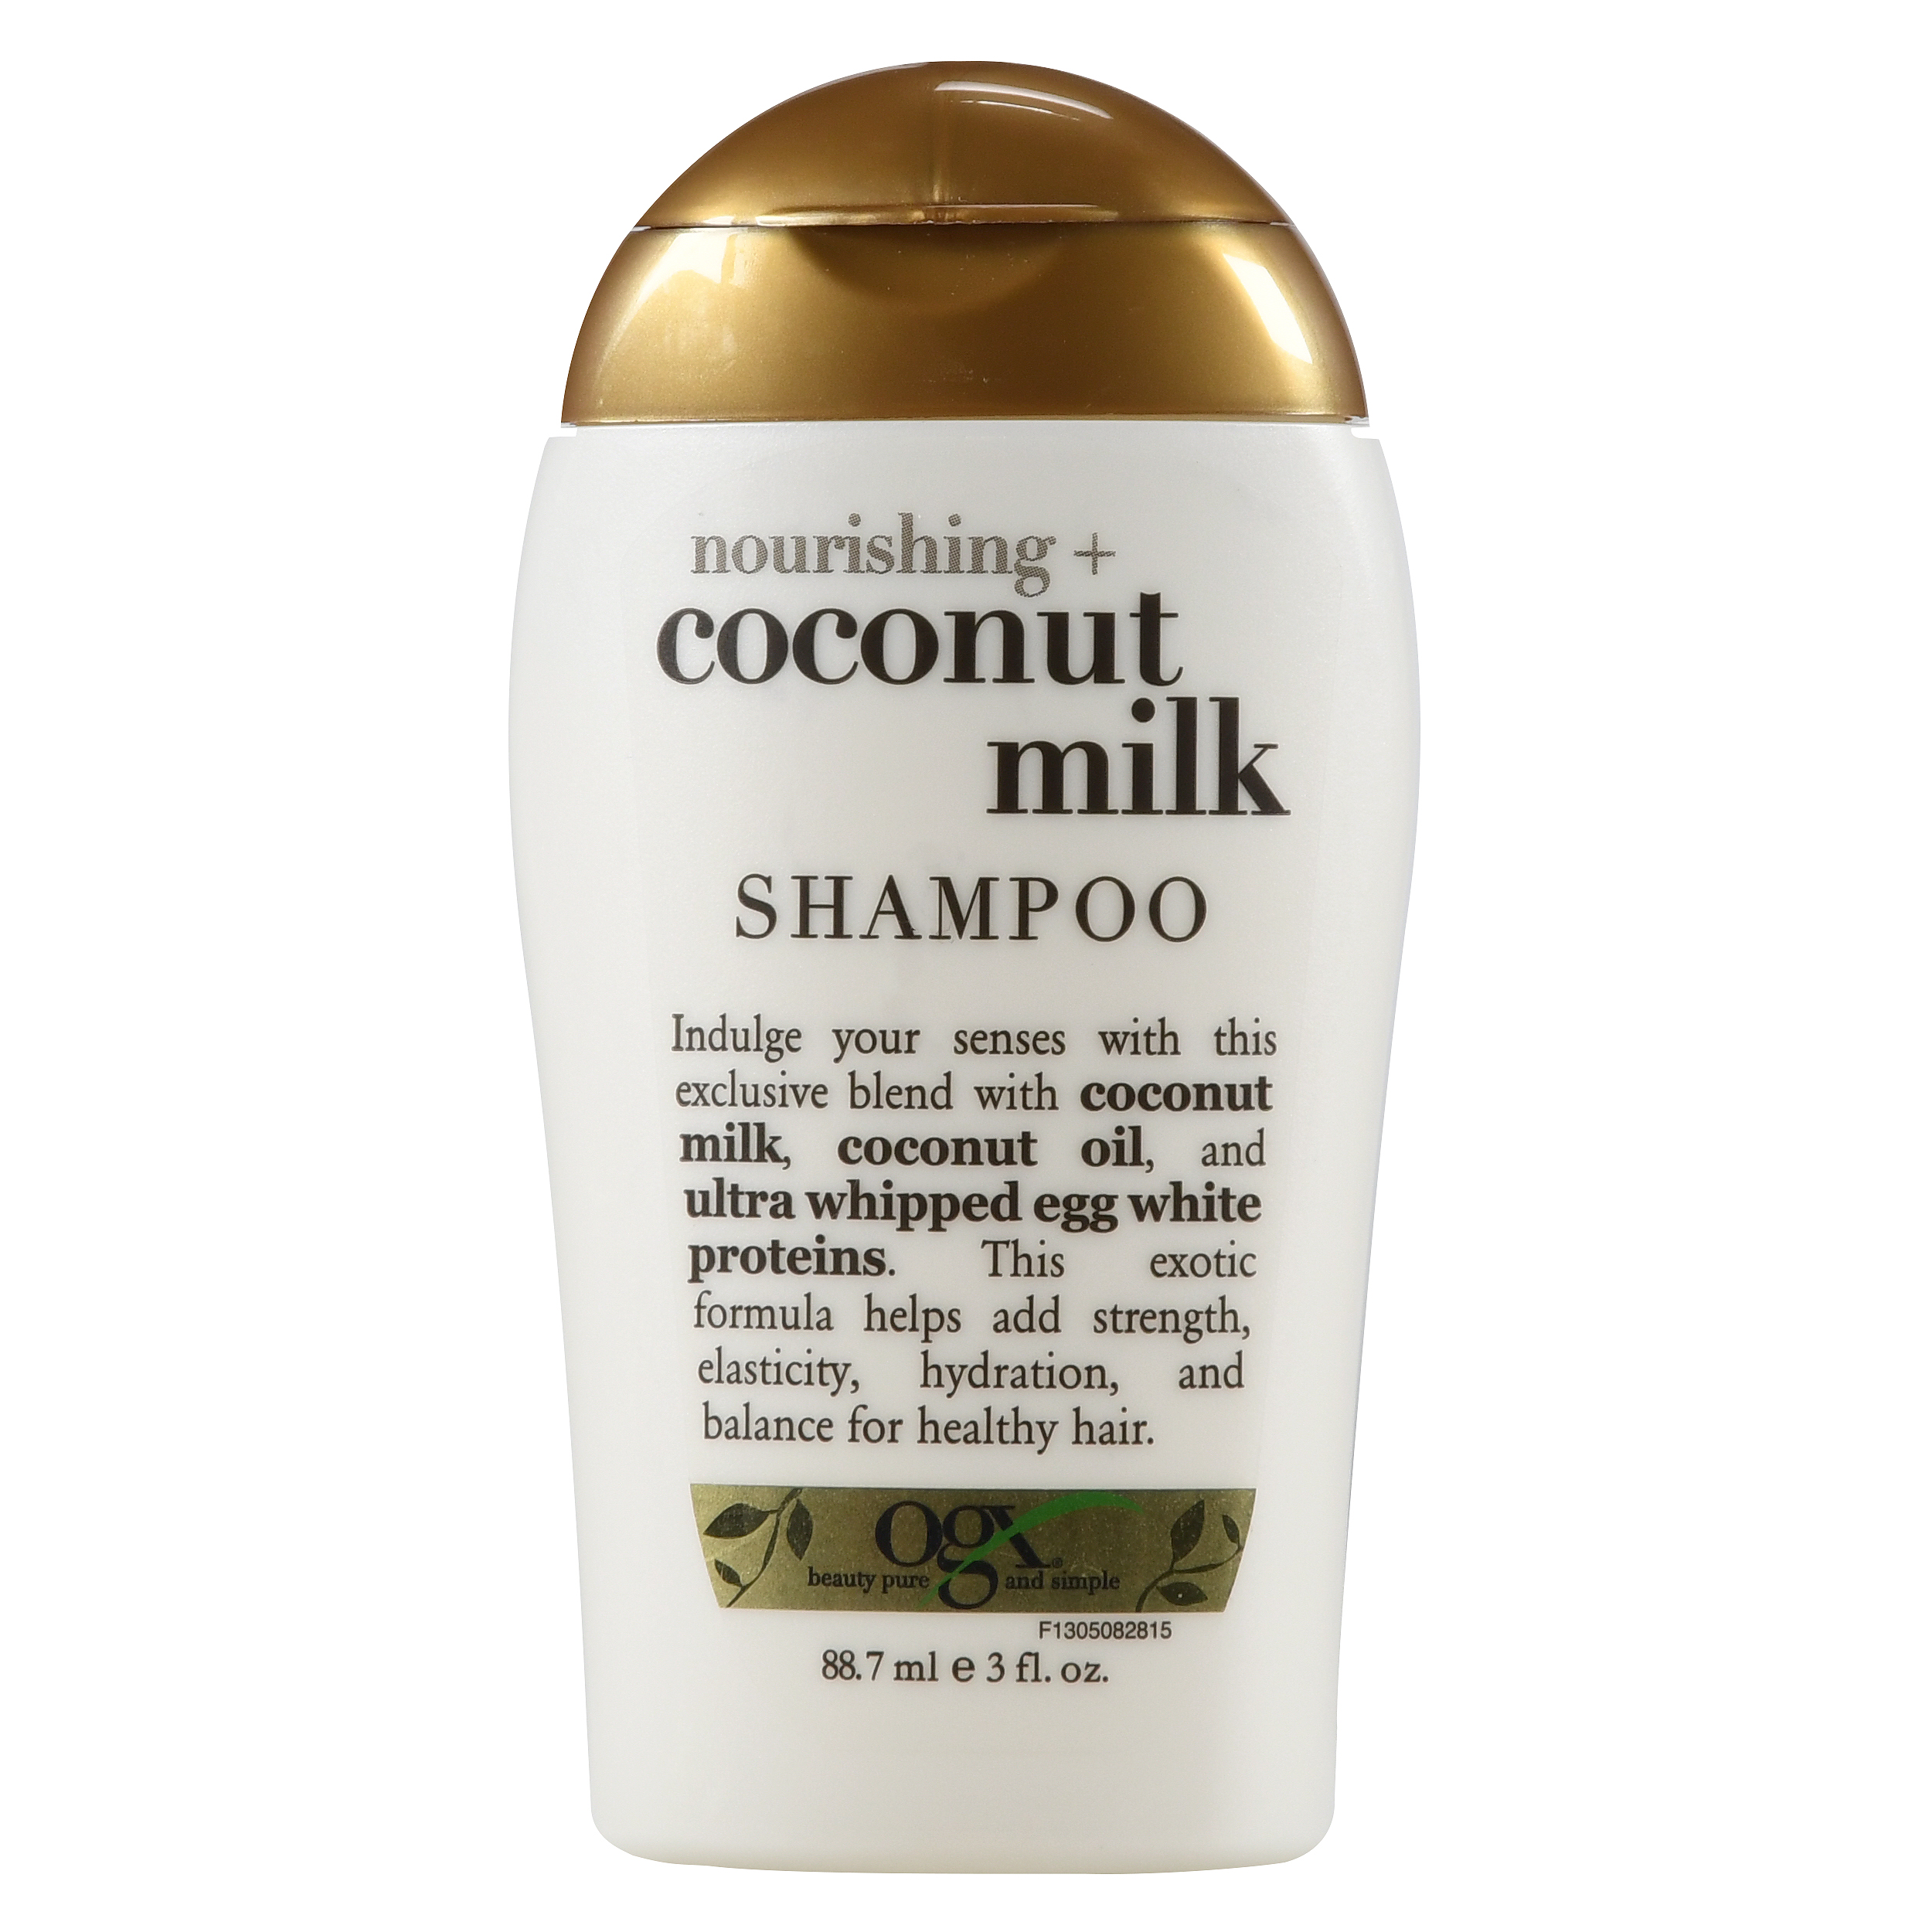 OGX Nourishing Coconut Milk Shampoo, 3 Oz